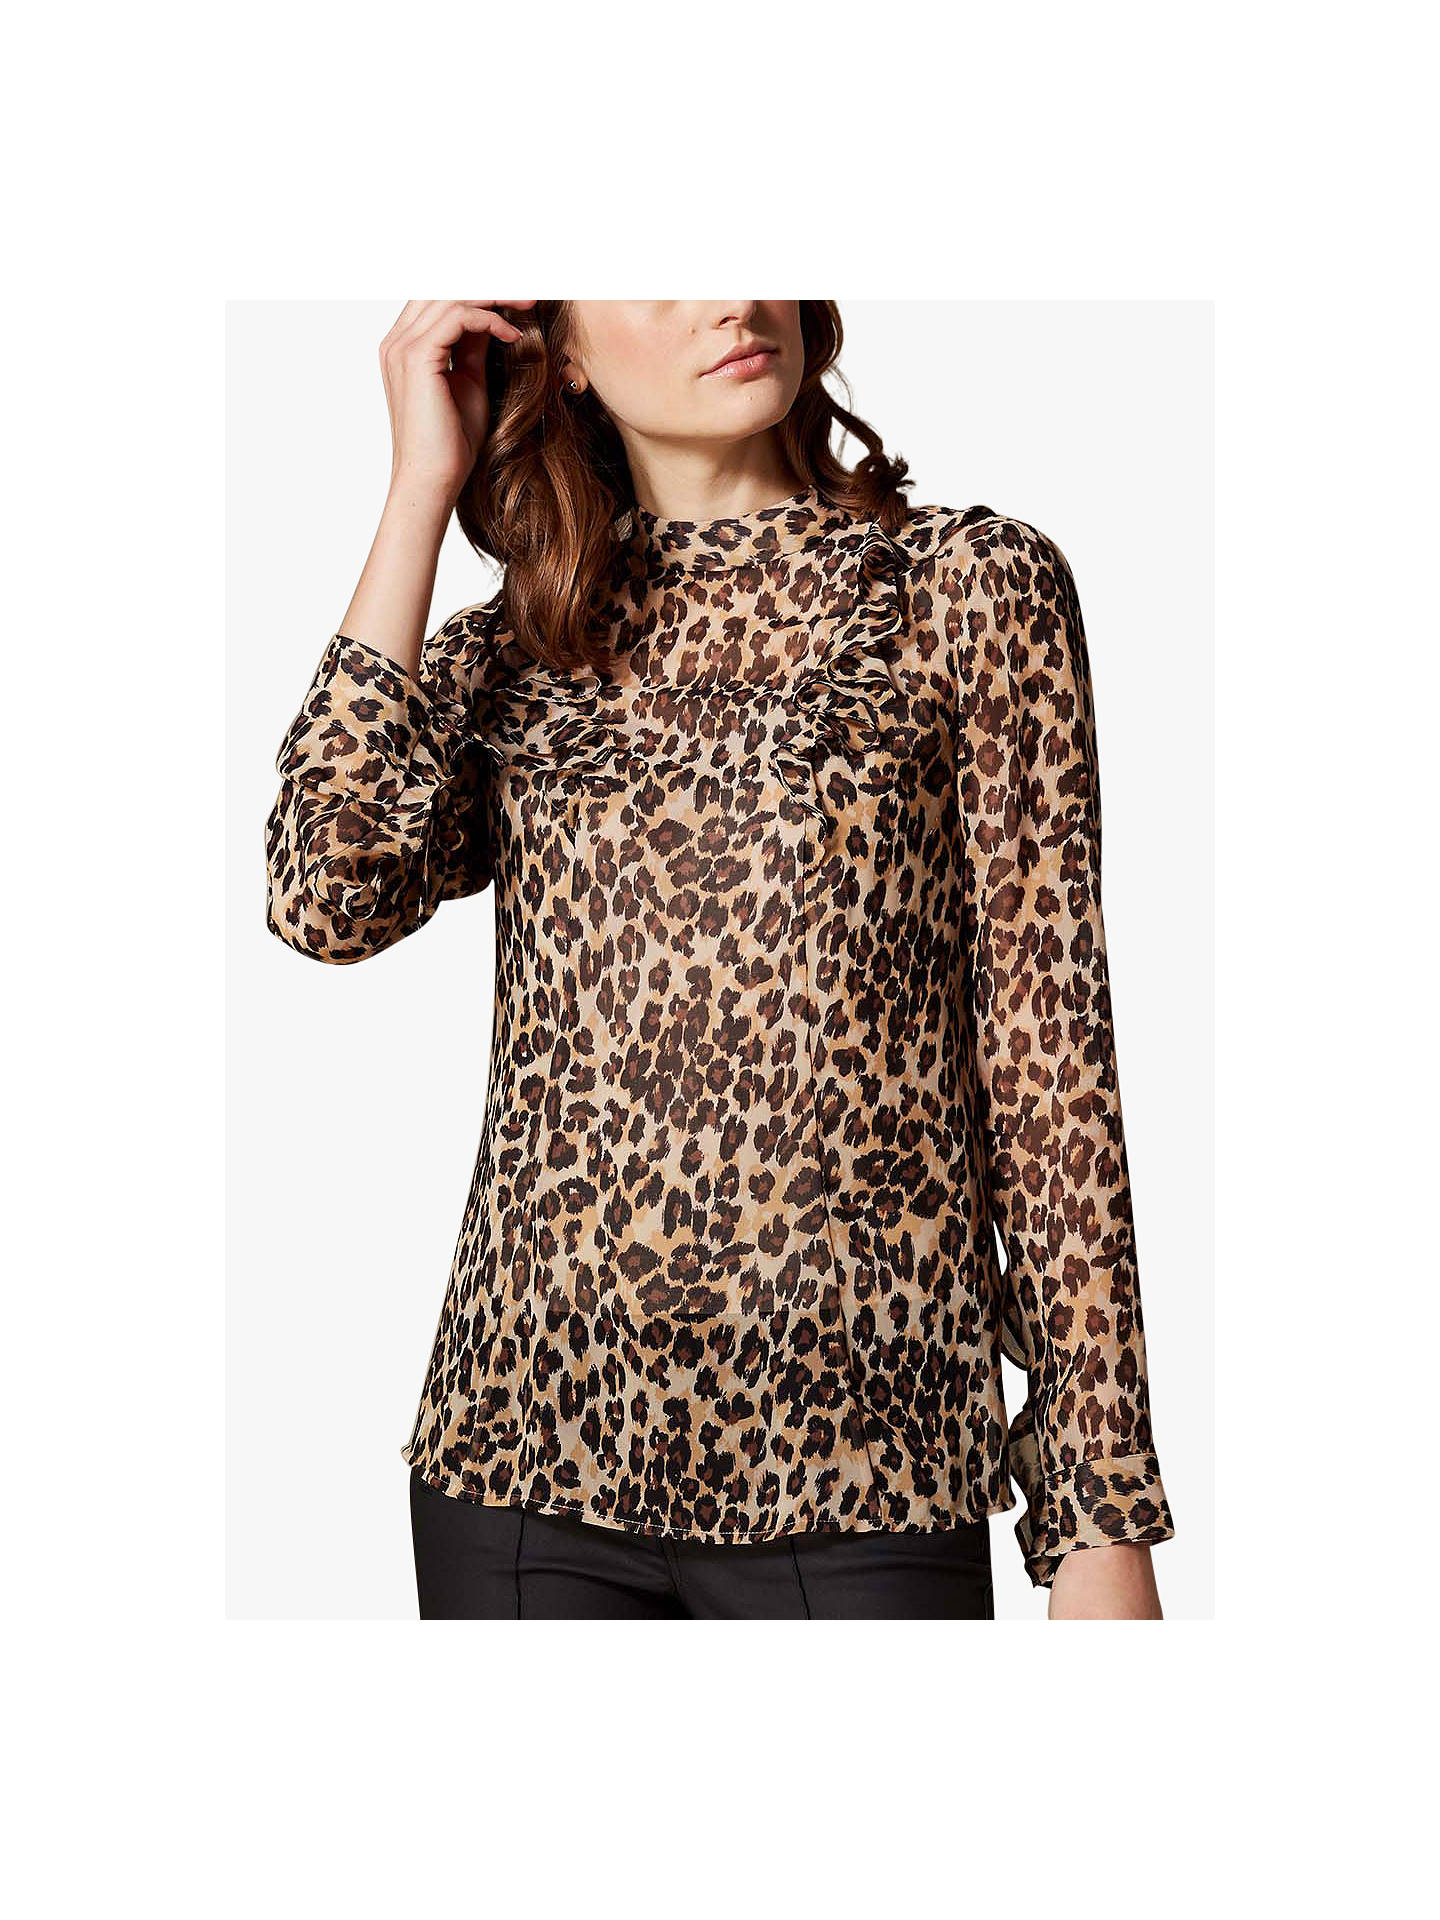 e97366c7859 Buy Karen Millen Leopard Print Blouse, Multi, 6 Online at johnlewis.com ...